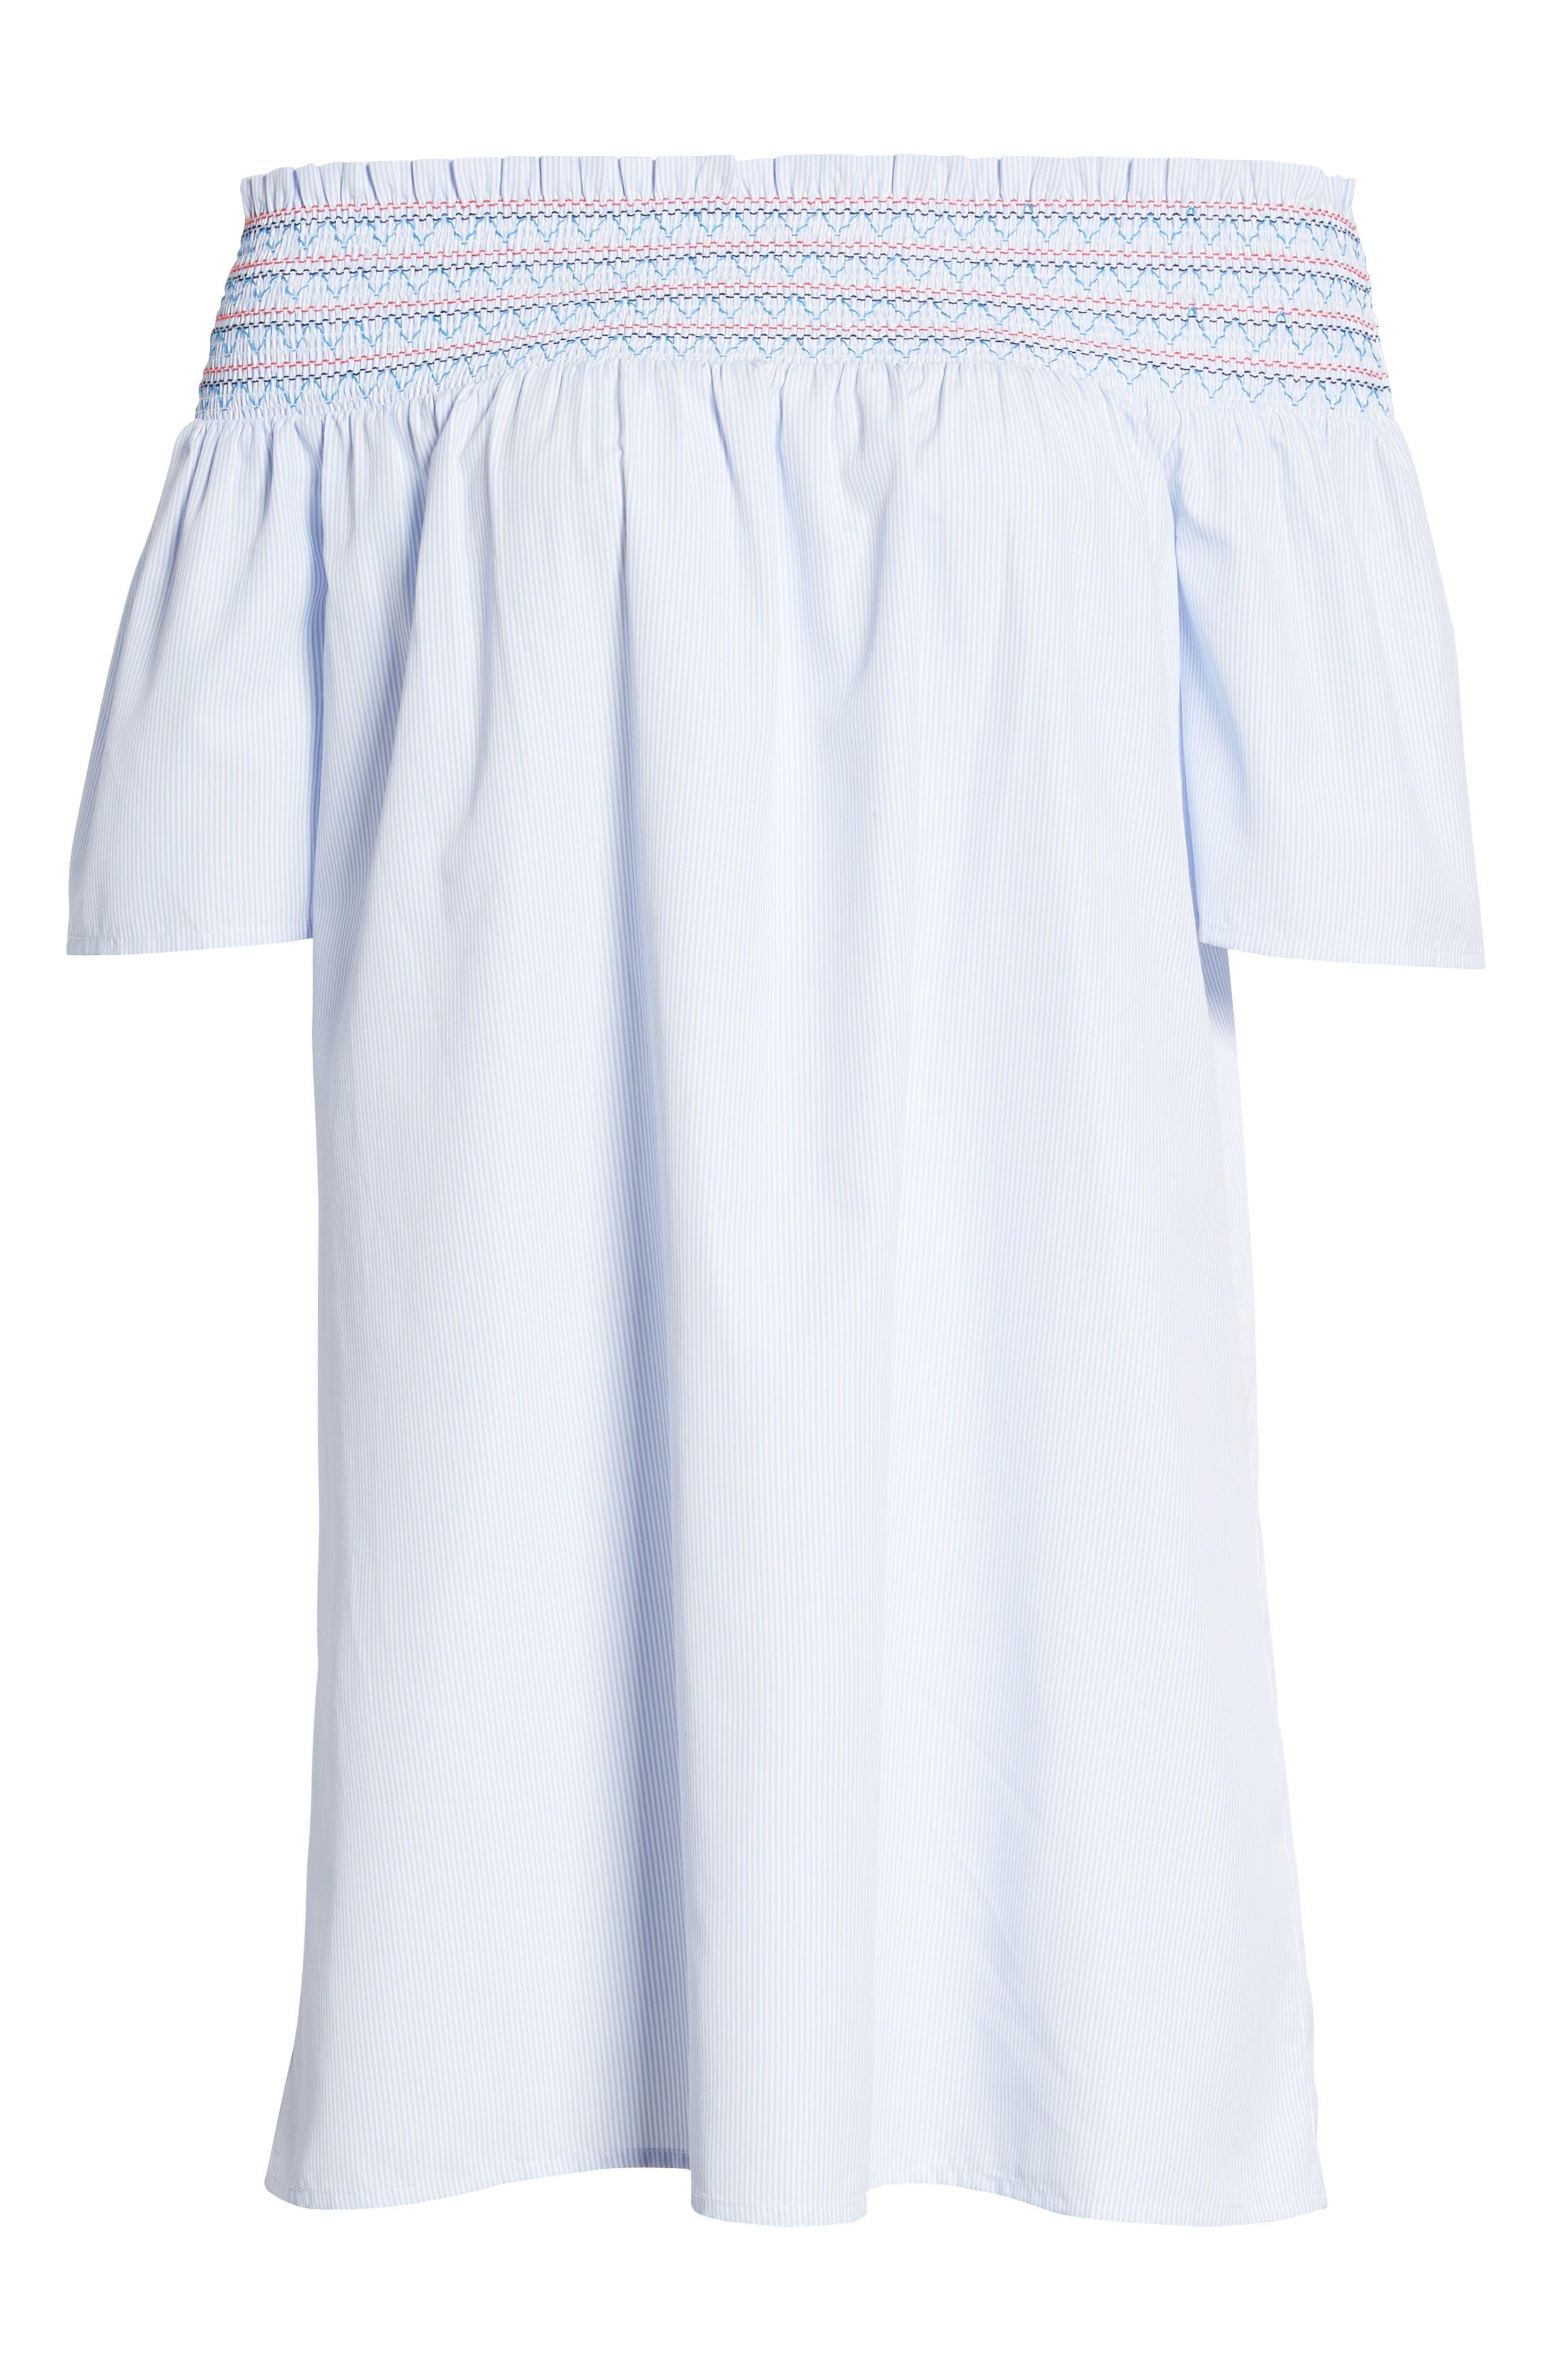 Smocked Off the Shoulder Dress,                             Alternate thumbnail 7, color,                             Bright White / Serenity